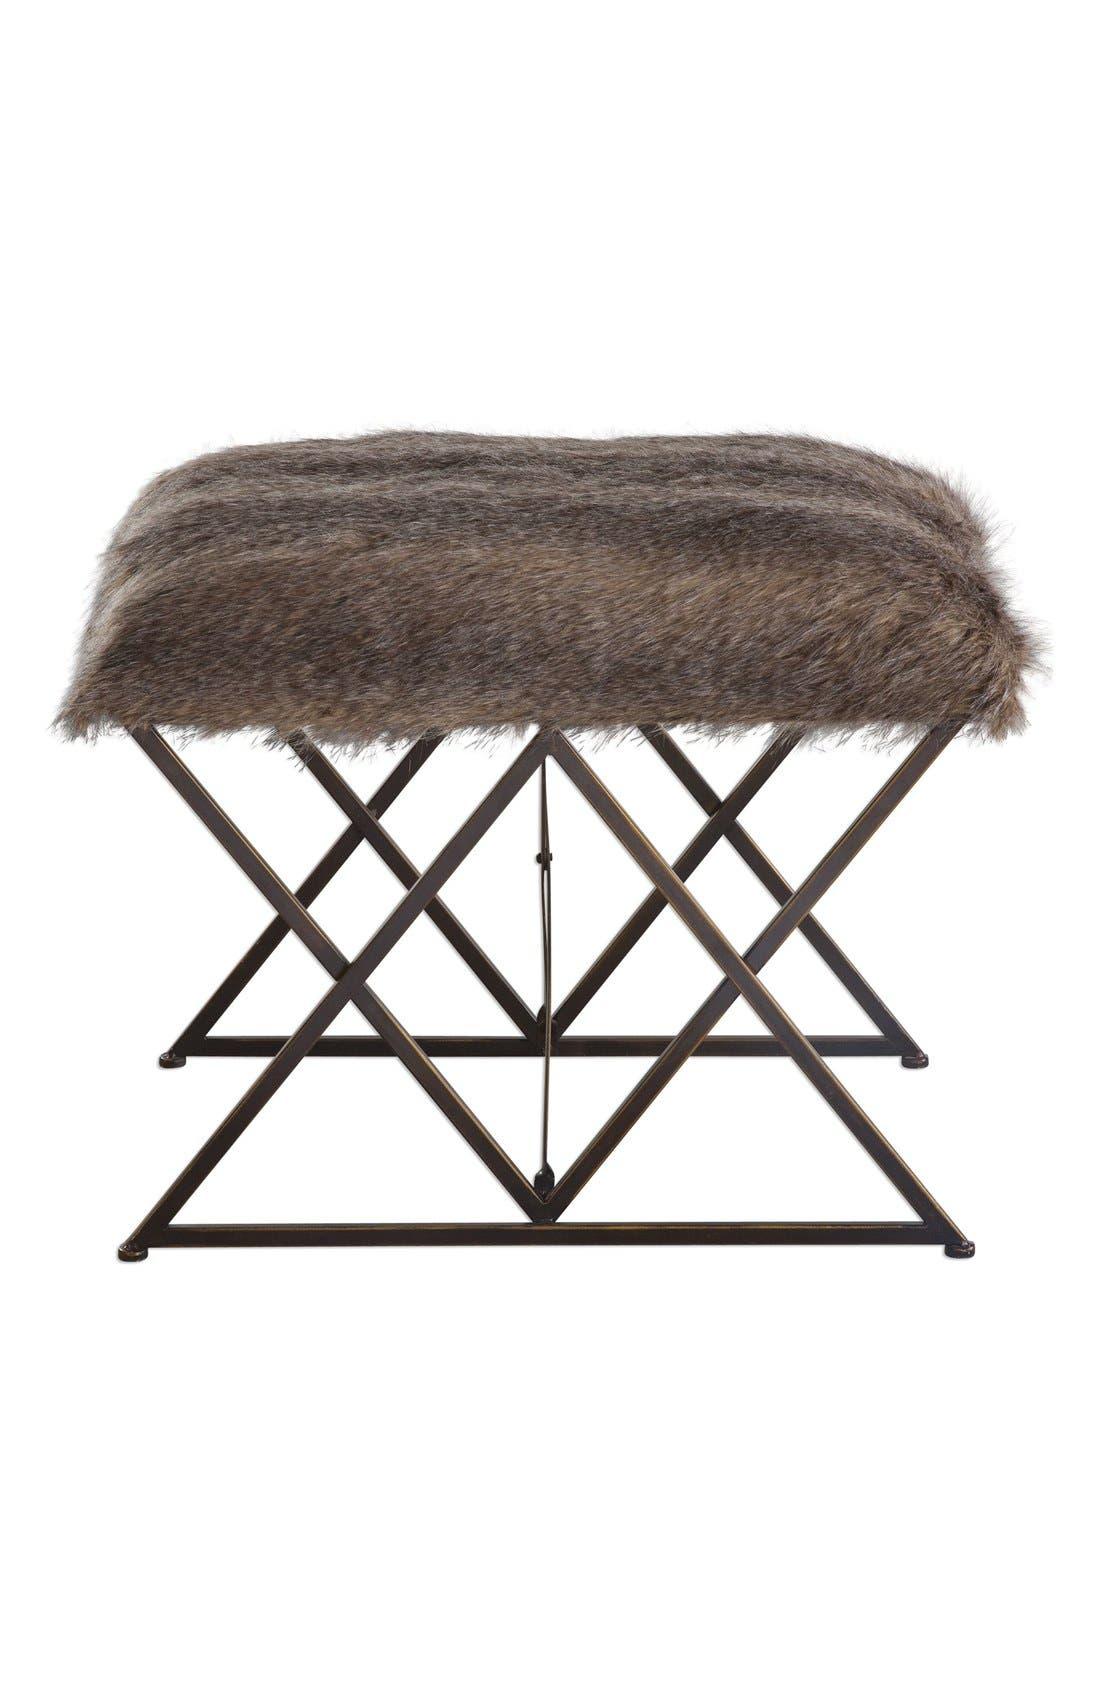 Main Image - Uttermost 'Brannen' Faux Fur Bench